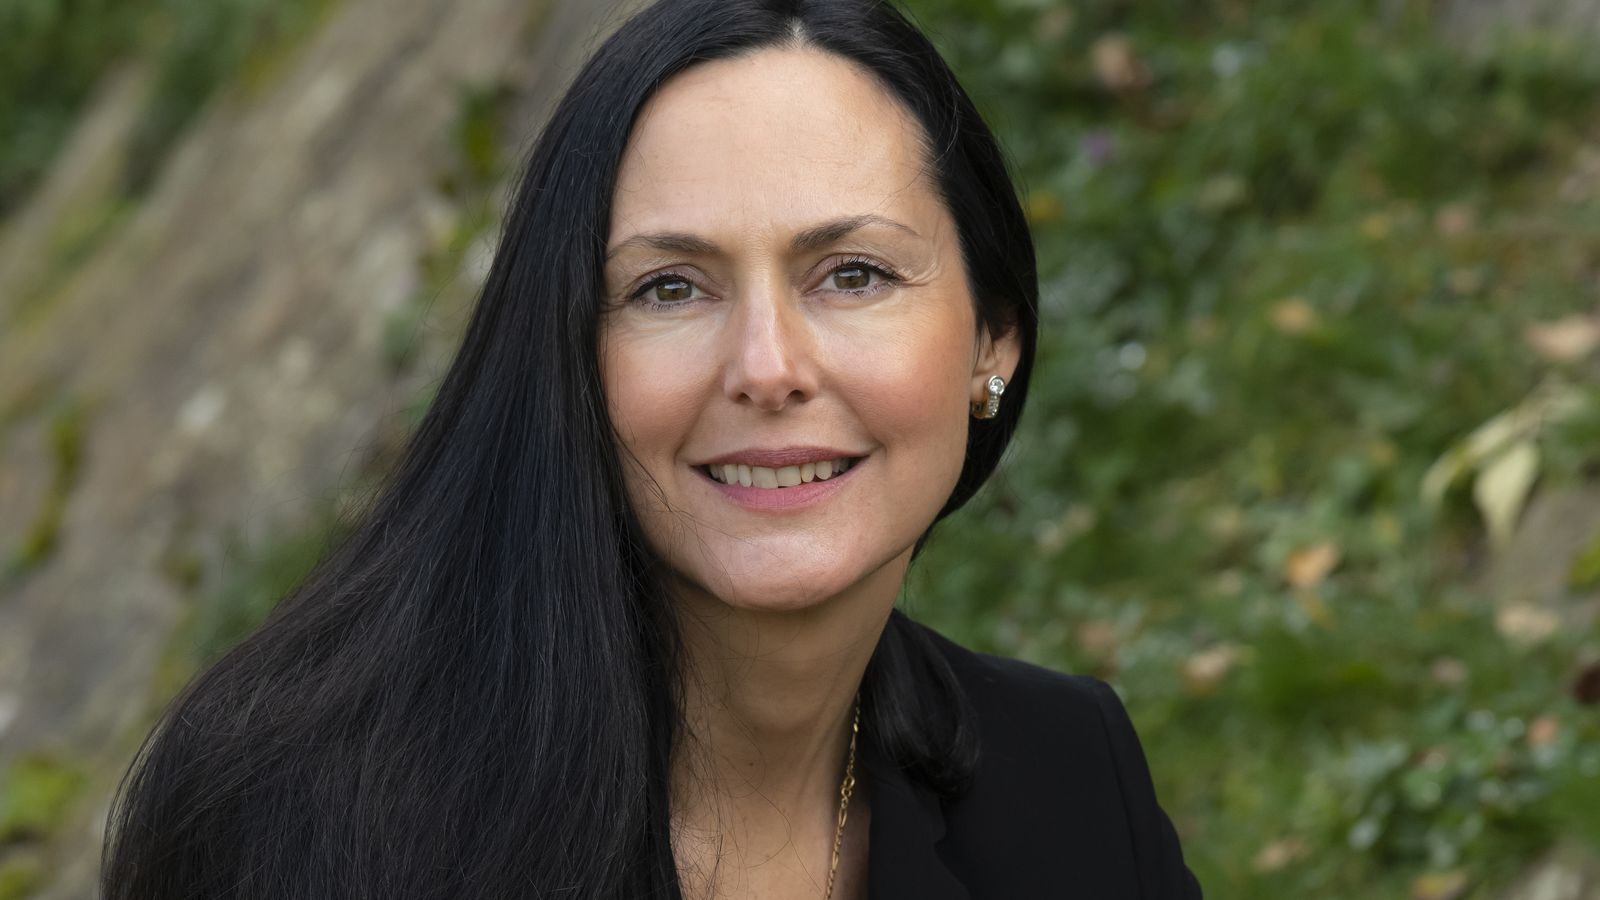 La candidata Olga Molné. / CC